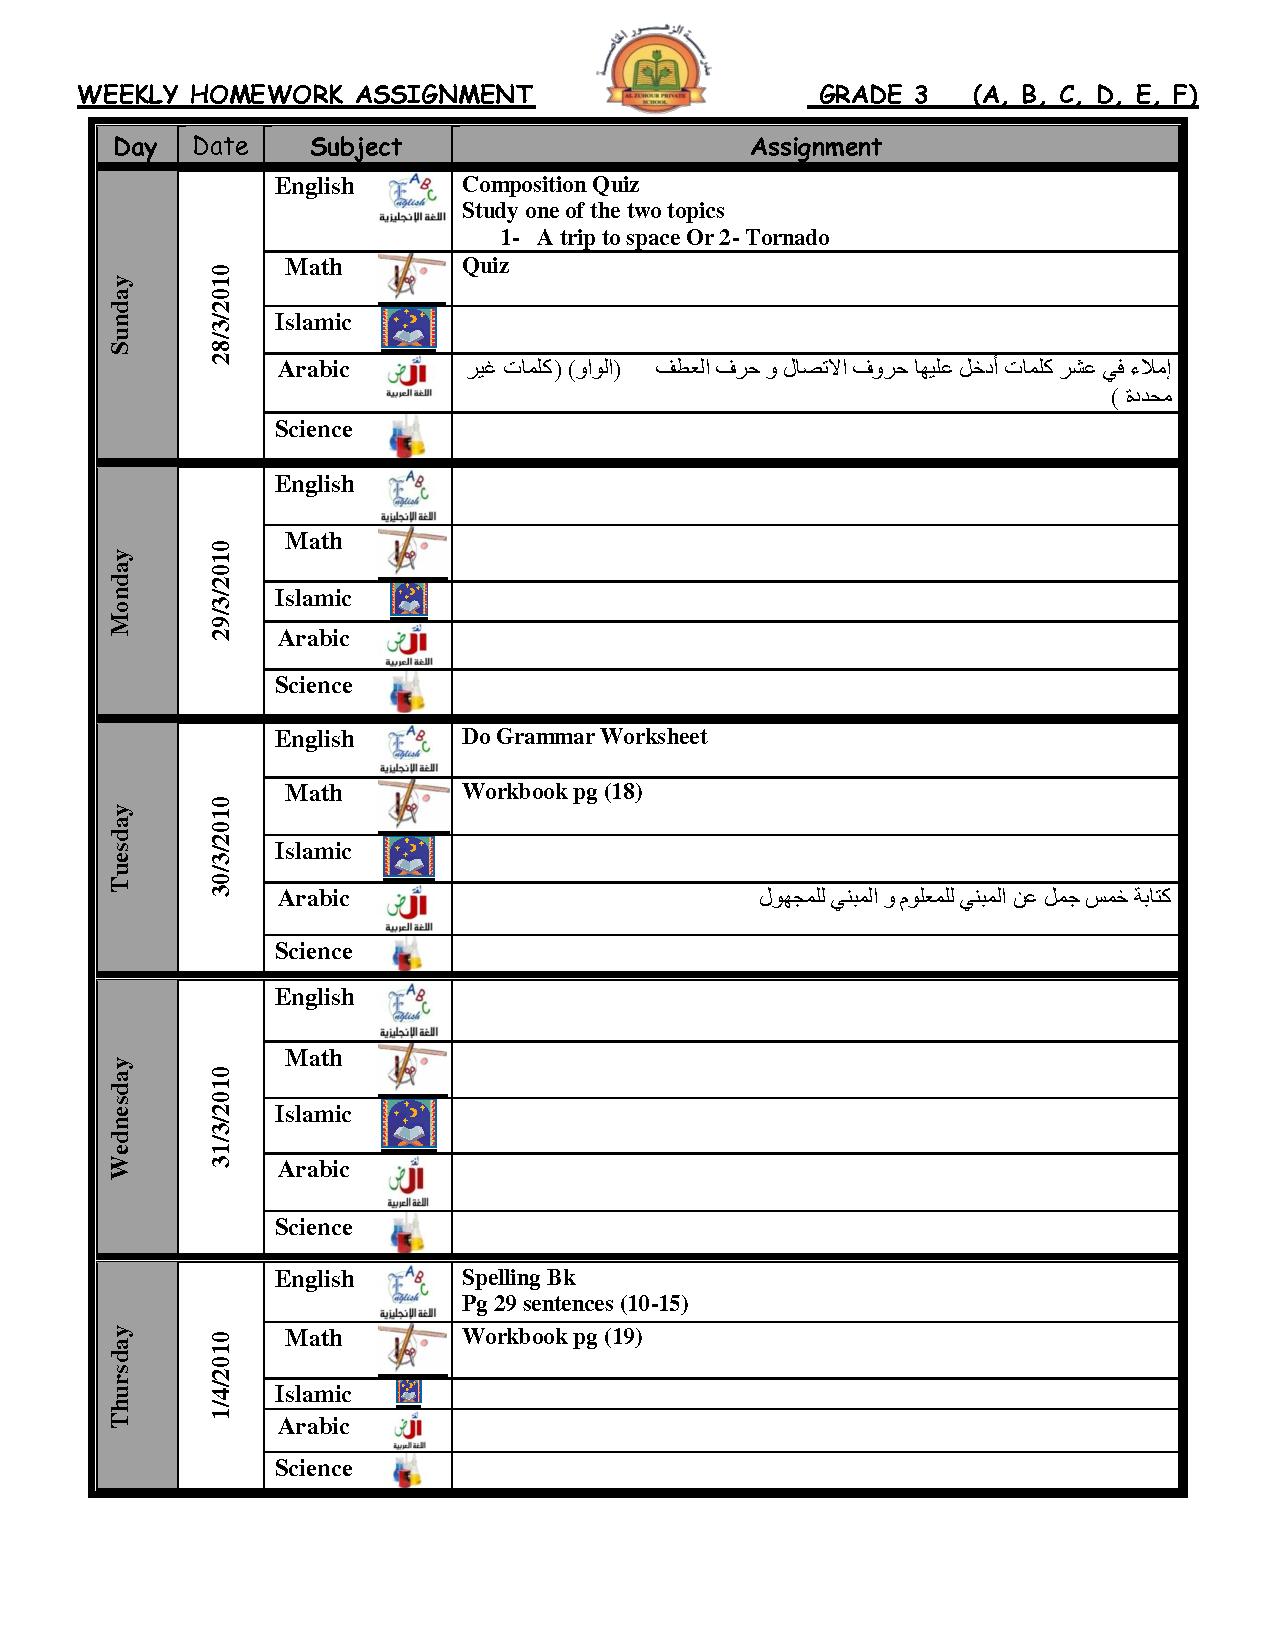 Printable Daily Homework Assignment Sheet |  Englishexpresspr - Free Printable Homework Assignment Sheets